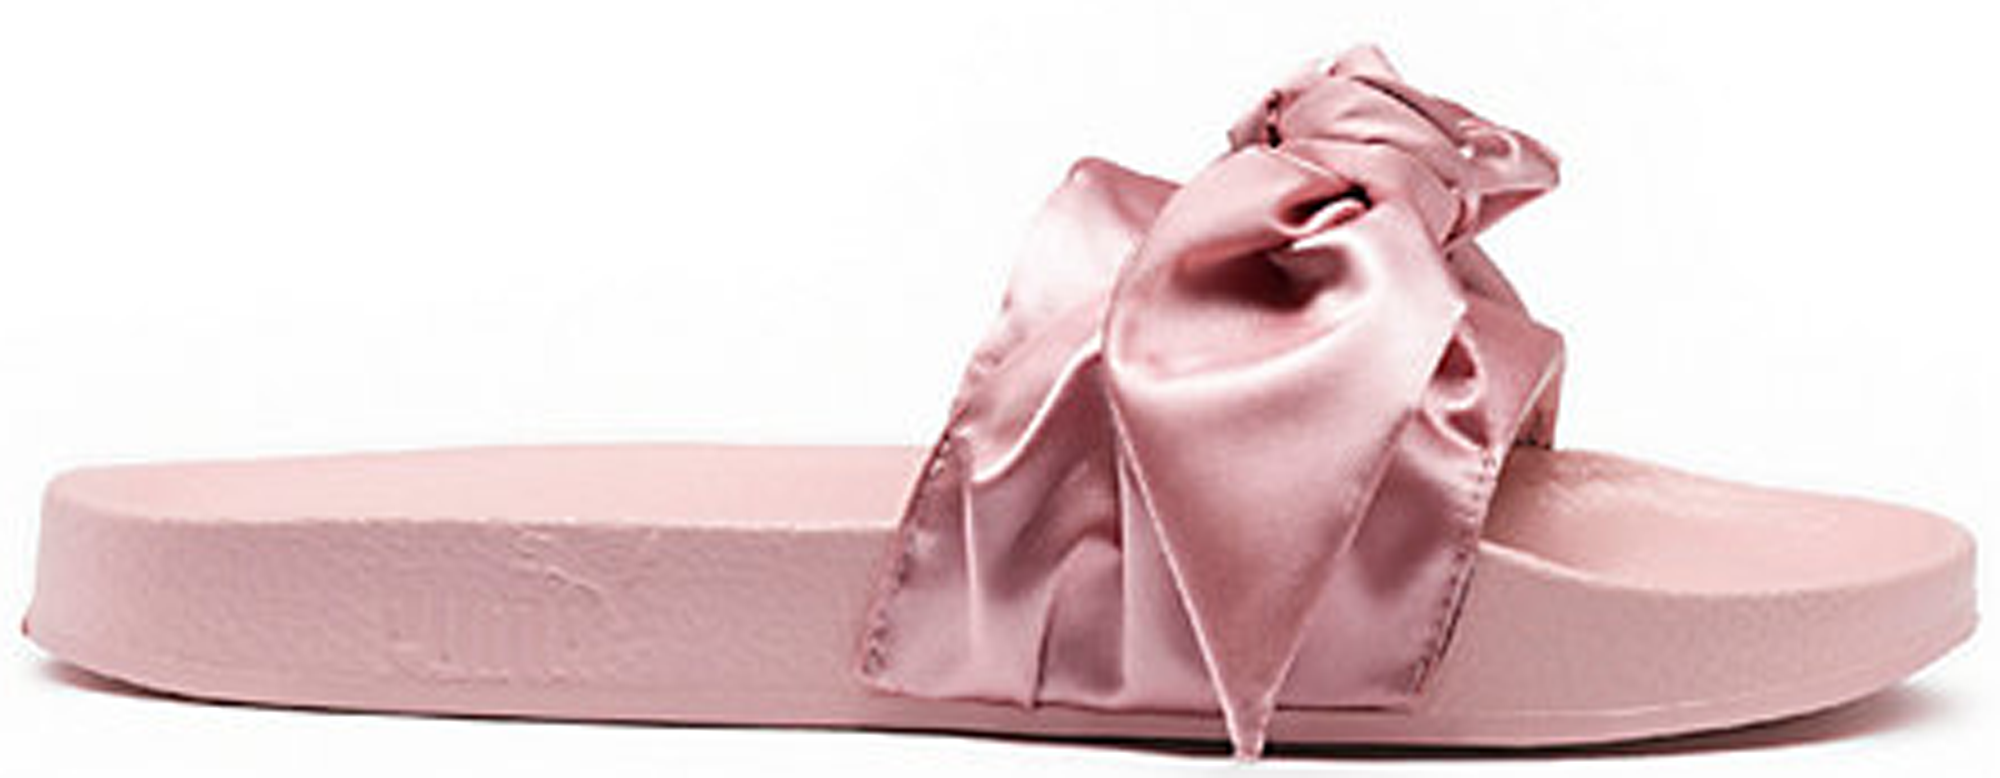 Puma Bow Slide Rihanna Fenty Pink (W)